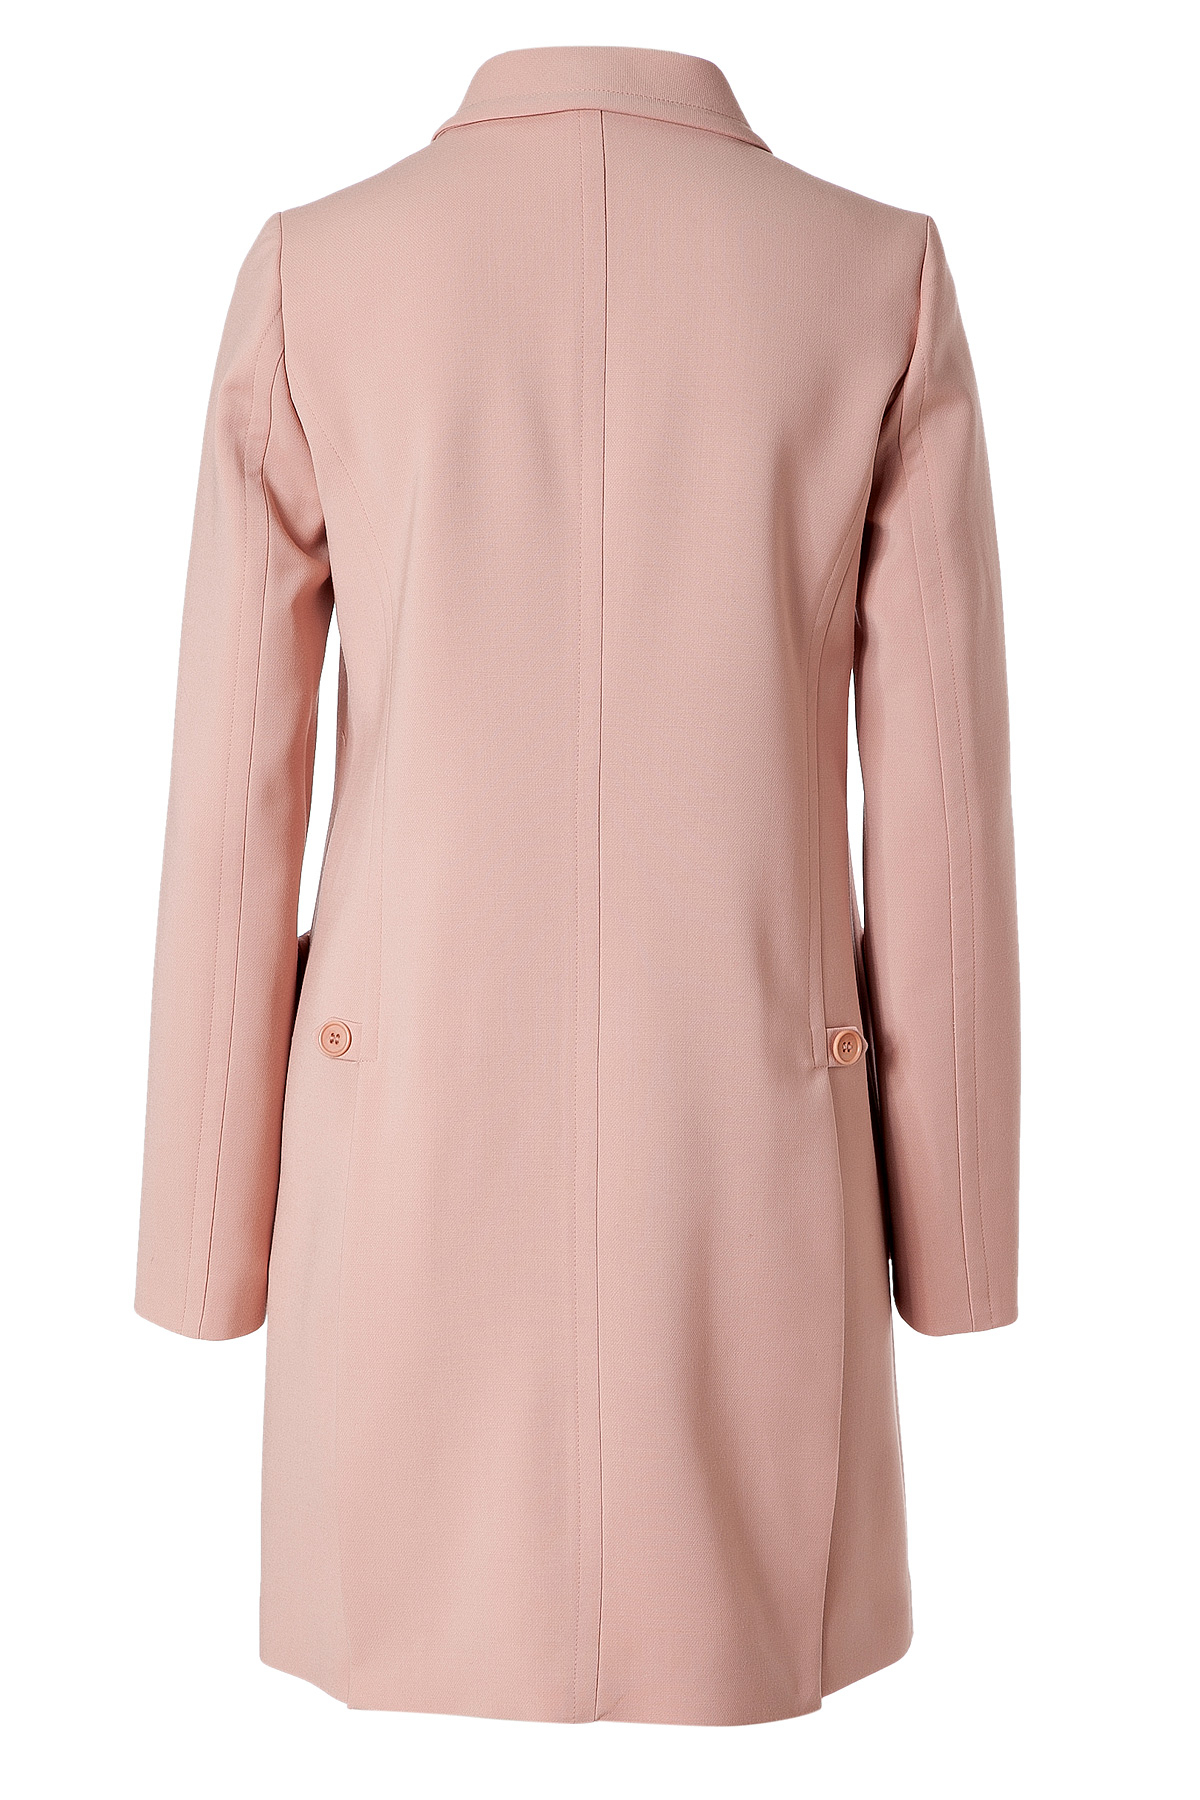 Jil sander navy Blush Wool Coat in Pink | Lyst